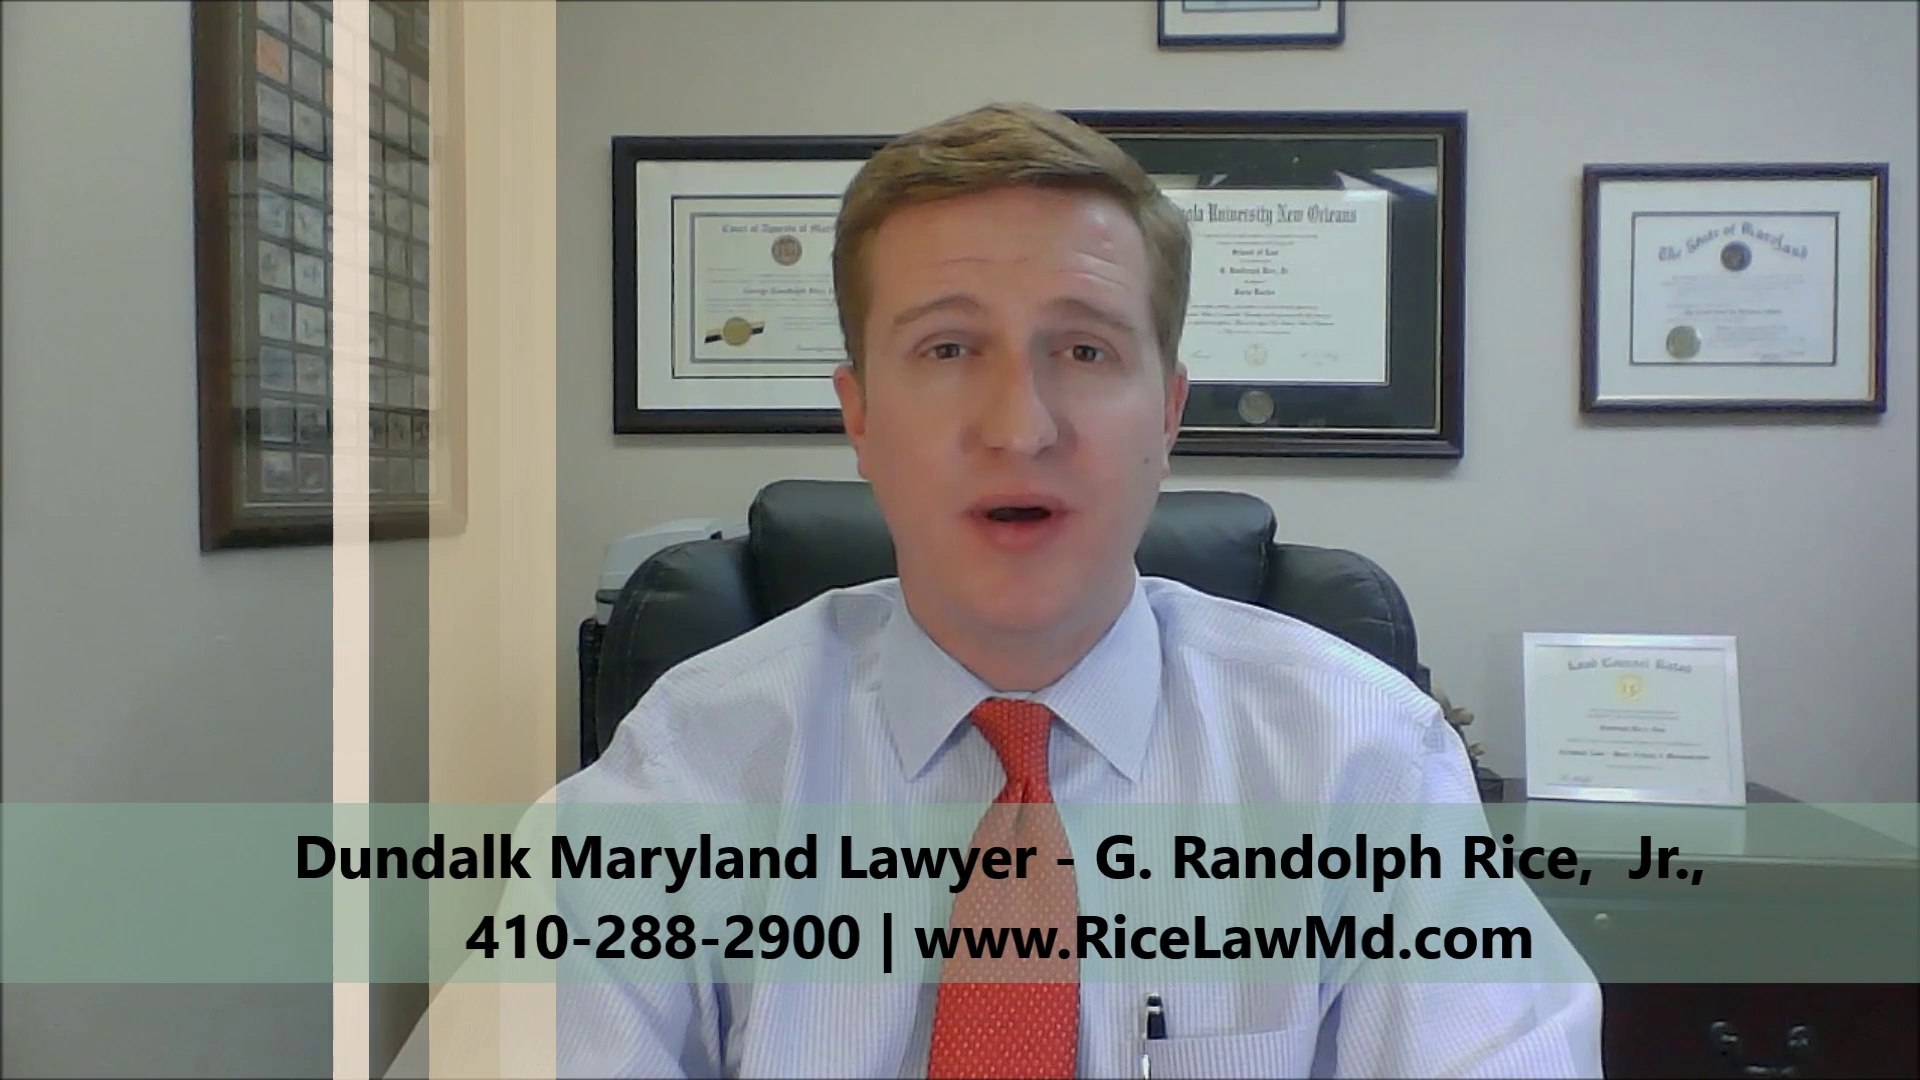 Dundalk Maryland Lawyer G. Randolph Rice Jr.